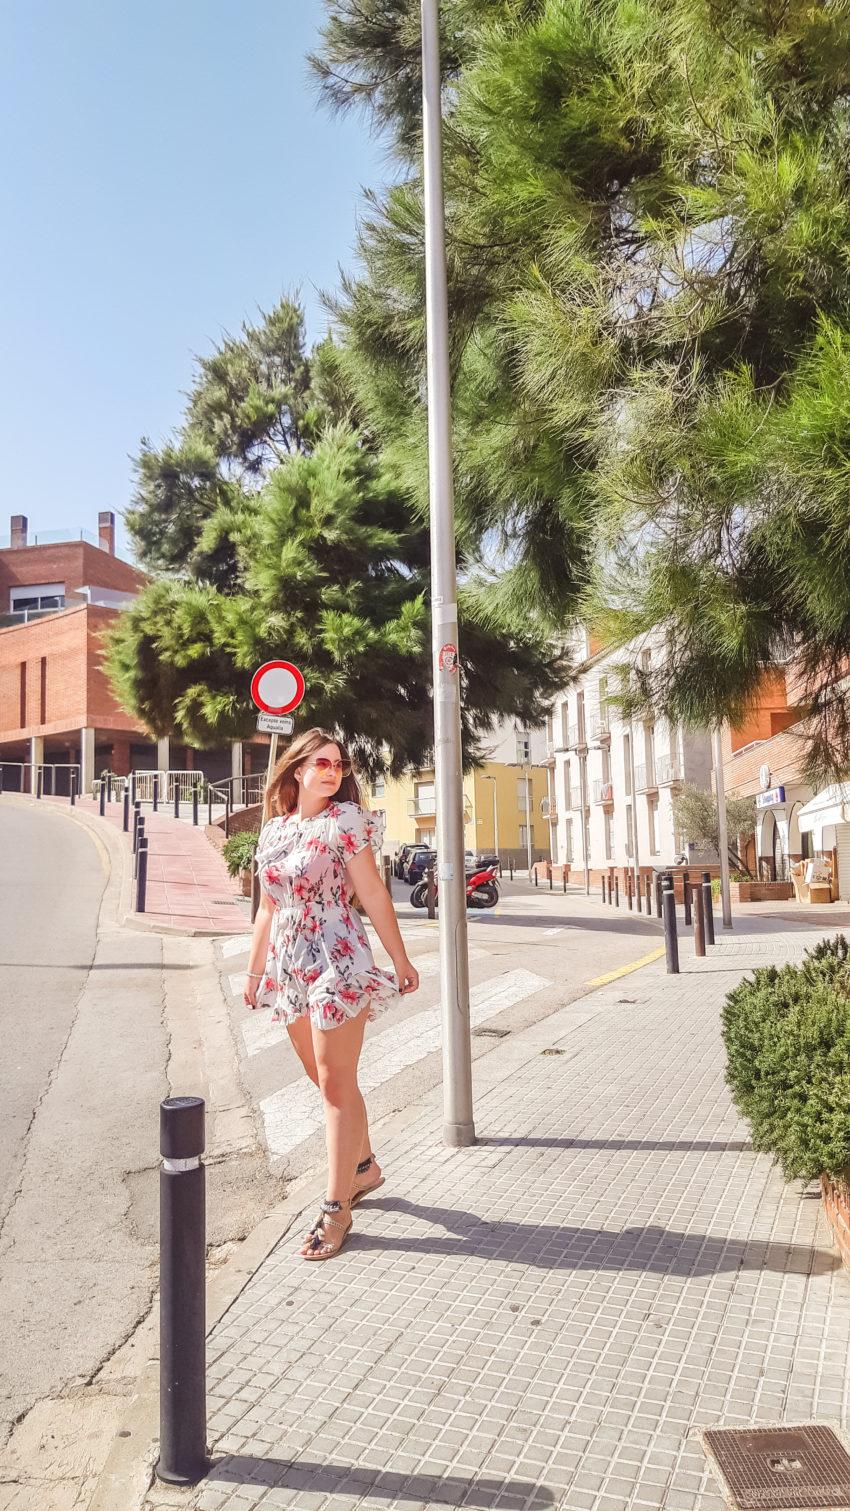 floral summer outfit livinglikev fashion blogger living like v style blogger